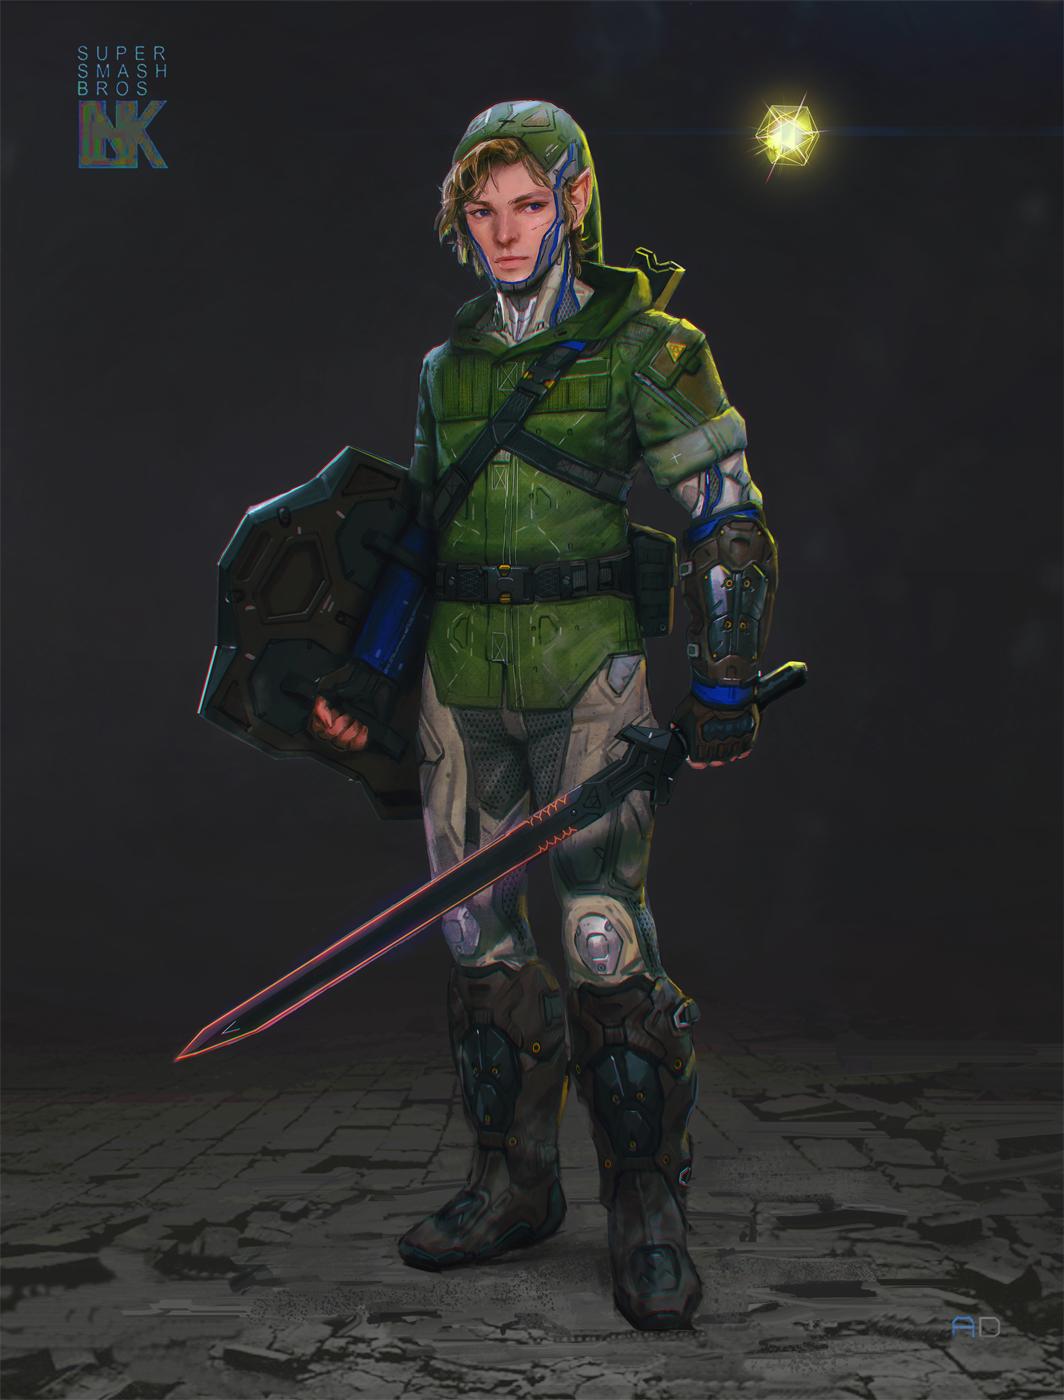 Gears Of War Studio Artist Imagines A More Metal Super Smash Bros.